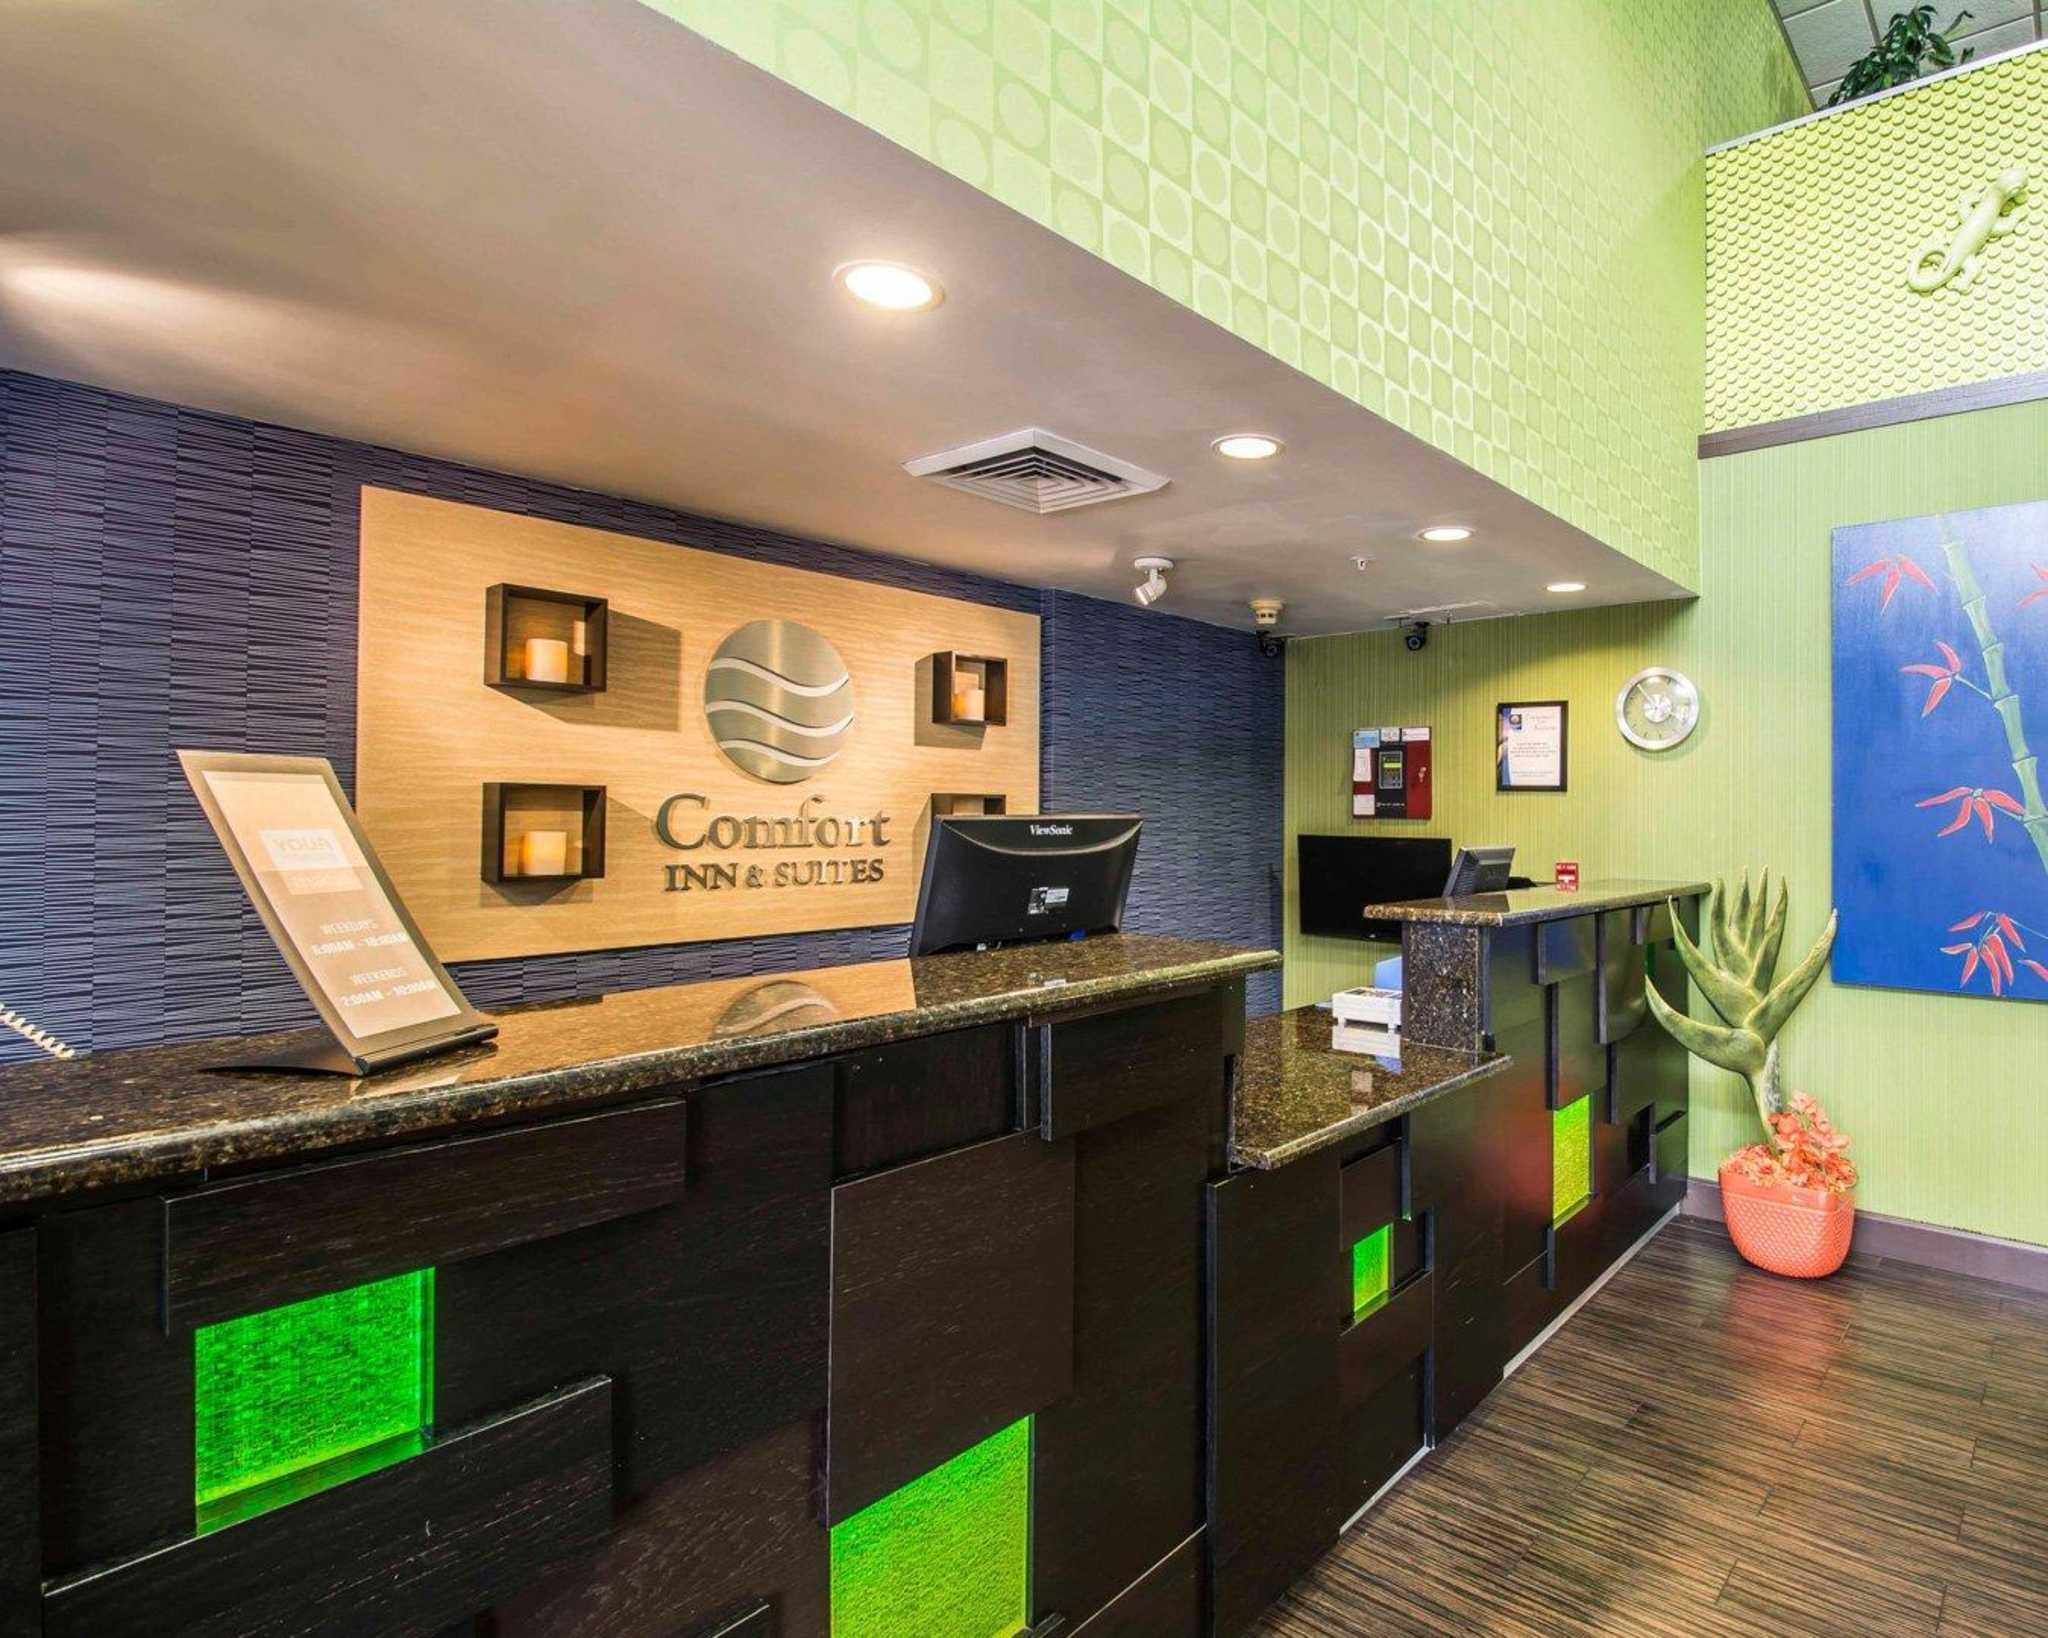 Comfort Inn & Suites Lantana - West Palm Beach South image 12